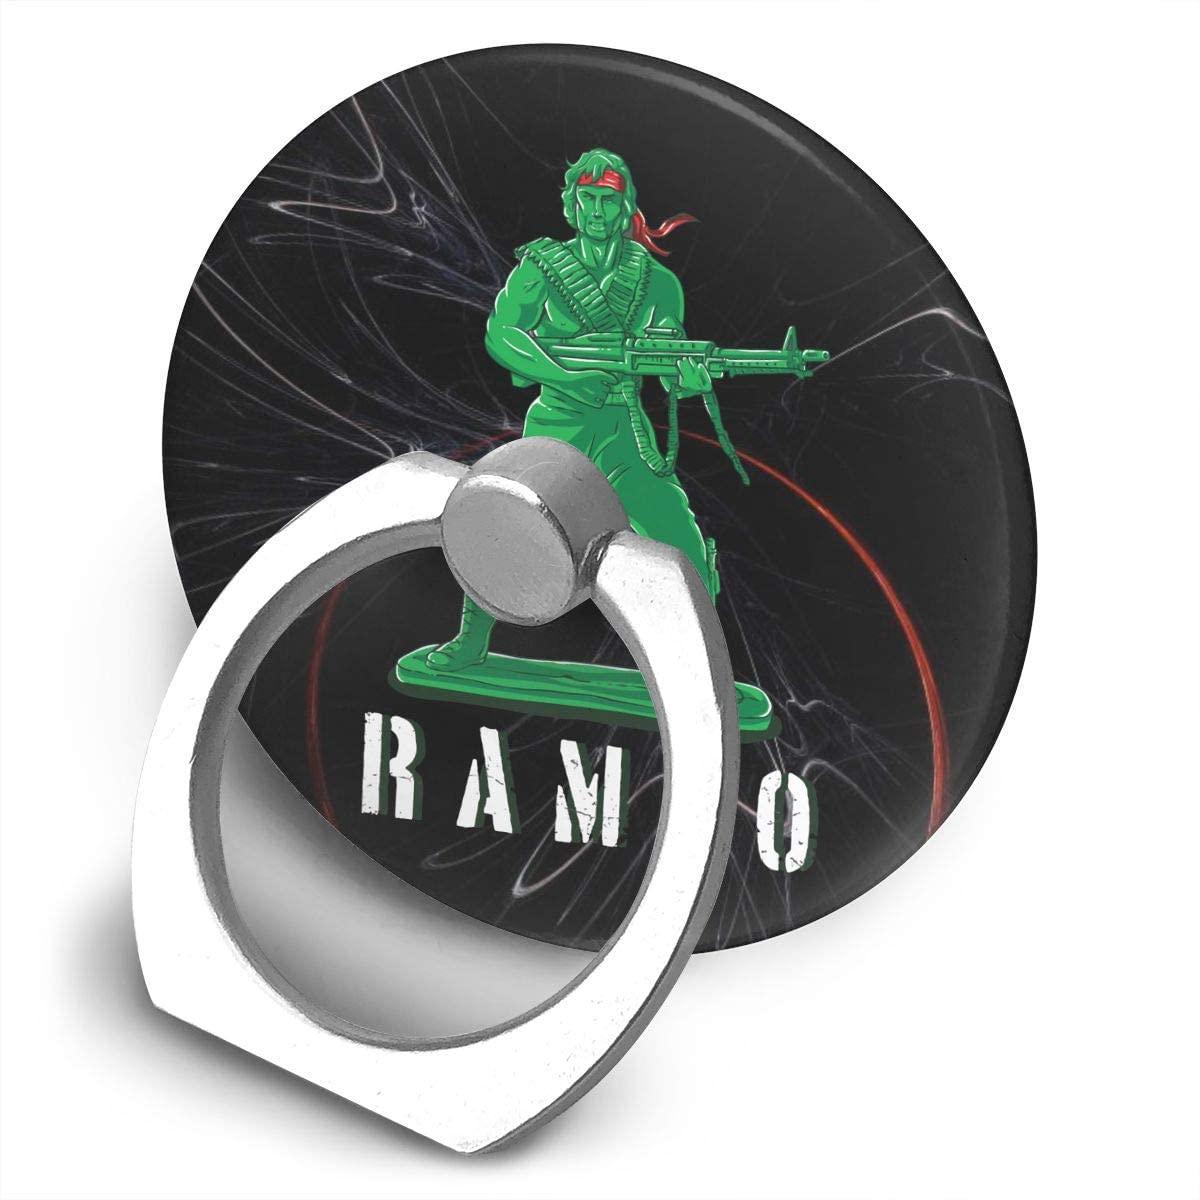 Hwxzviodfjg John J. Rambo Canada 360 Degree Rotating Ring Stand Cell Phone Mount